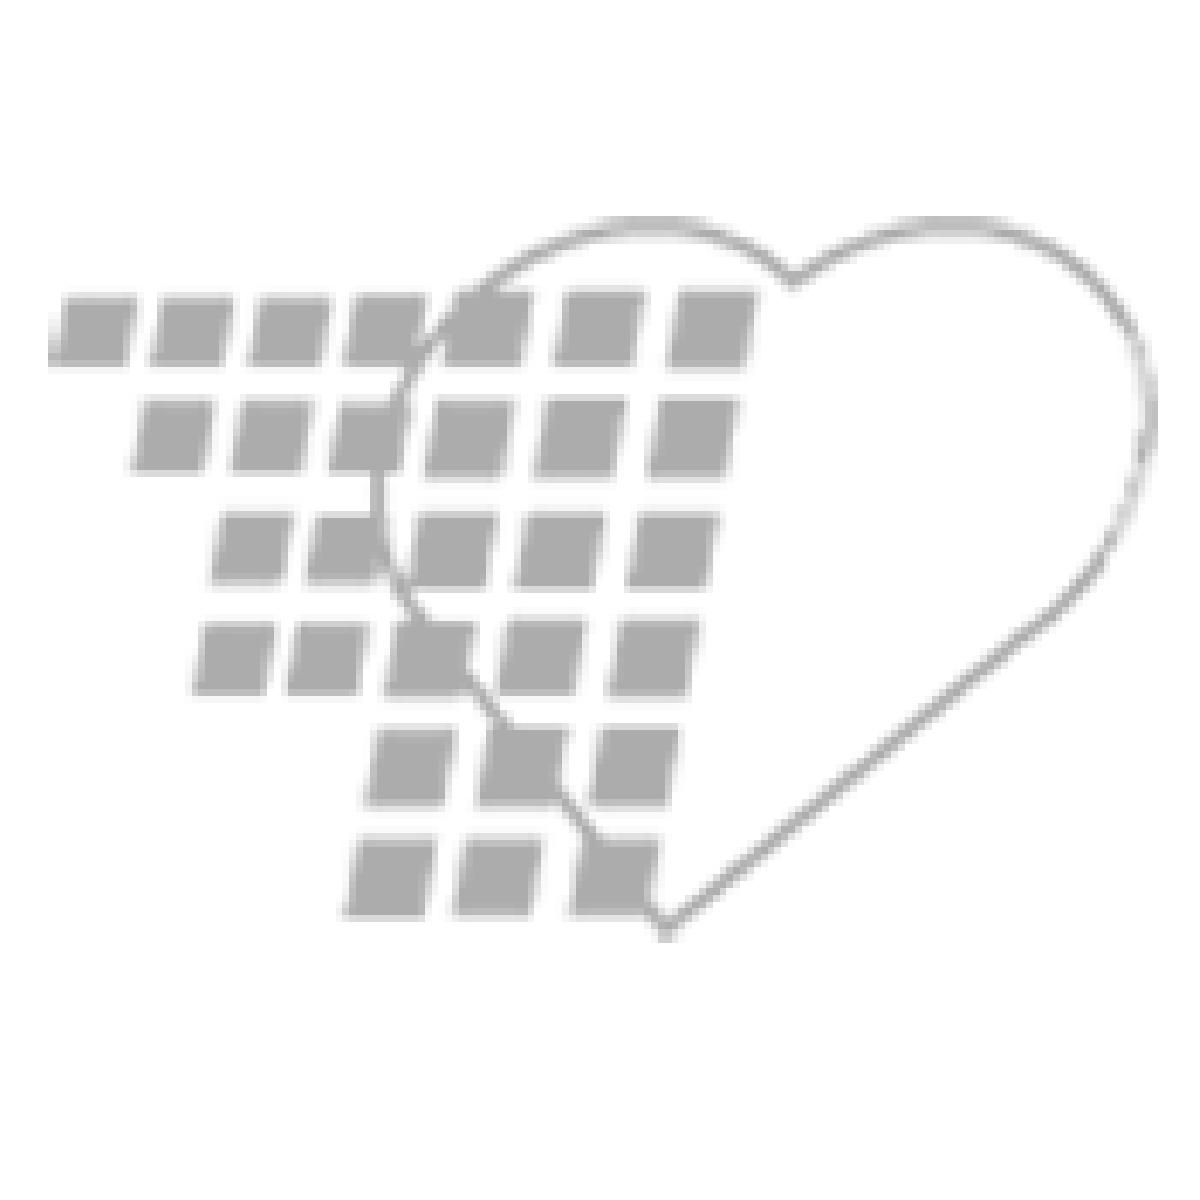 02-43-9851 Phillips Symbio Rhythm Simulator Module for Defibrillators